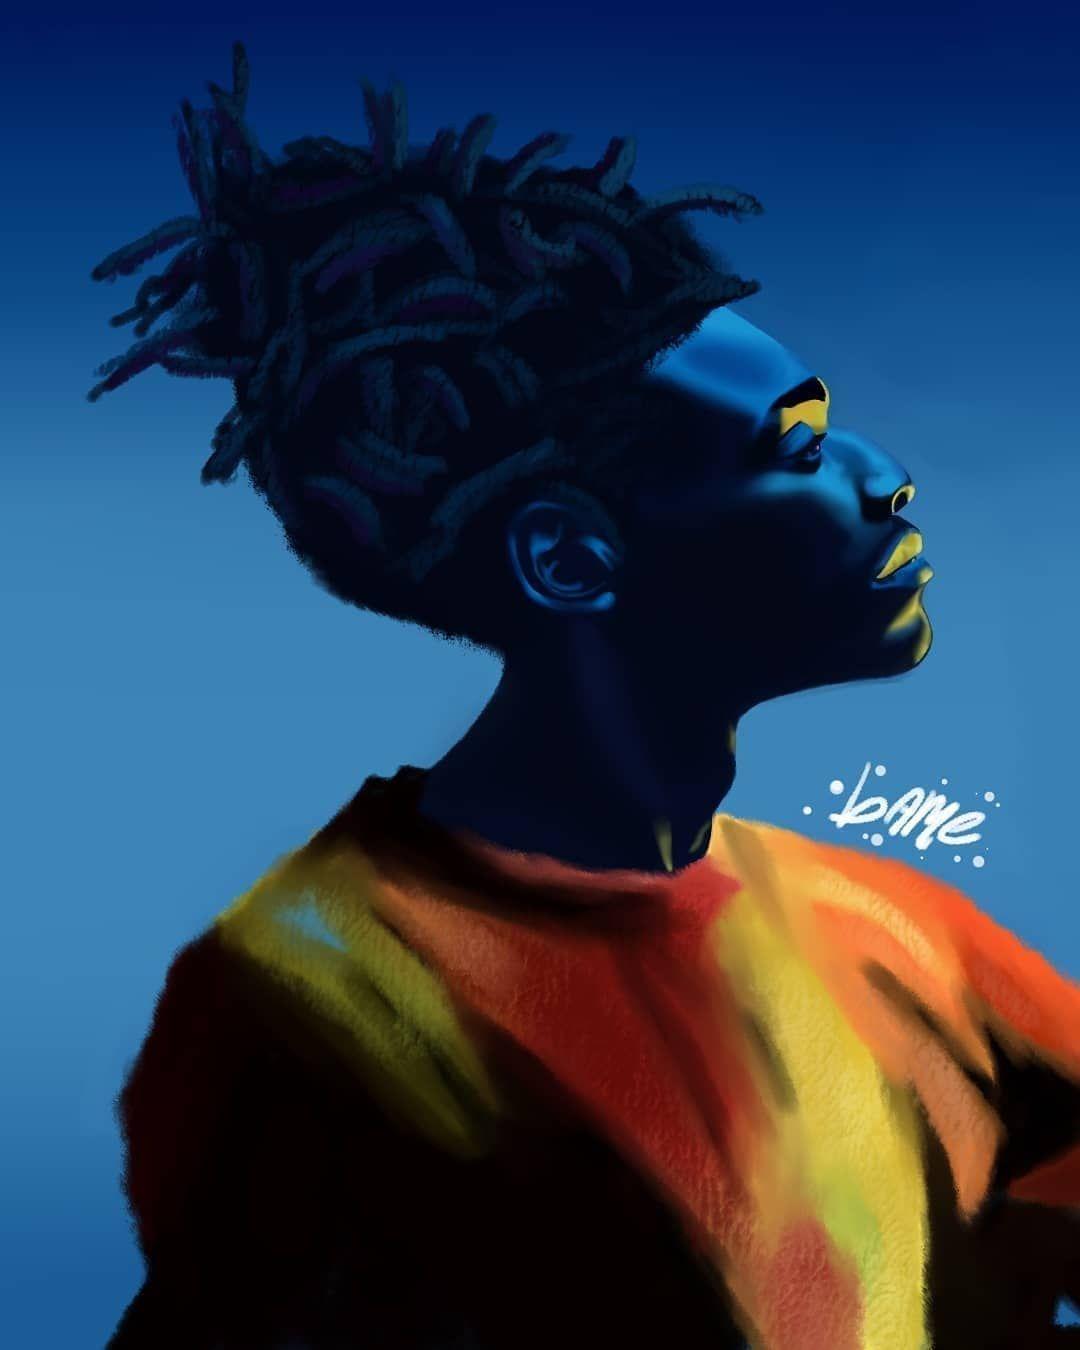 #DopeBlackArt by @_bame_  17 Year old artist 🙌 . . . #melanin #blackgirlmakeup #blackgirl #melaninqueen #dopeblackart #streetart #blackgirlyoga #blackgirlmagic #melaninpoppin #artist #dopeblackartgottaluvit👑 #blackartmatters #blackgirls #melaningoddess #dopeblackartart #blackartists #blackgirlsrock #dopeblackartist #dopeblackartwork #blackartist #blackart #melaninonfleek #art #blackartsupport #melaninmagic  #blackarts #artwork #dopeblackartists